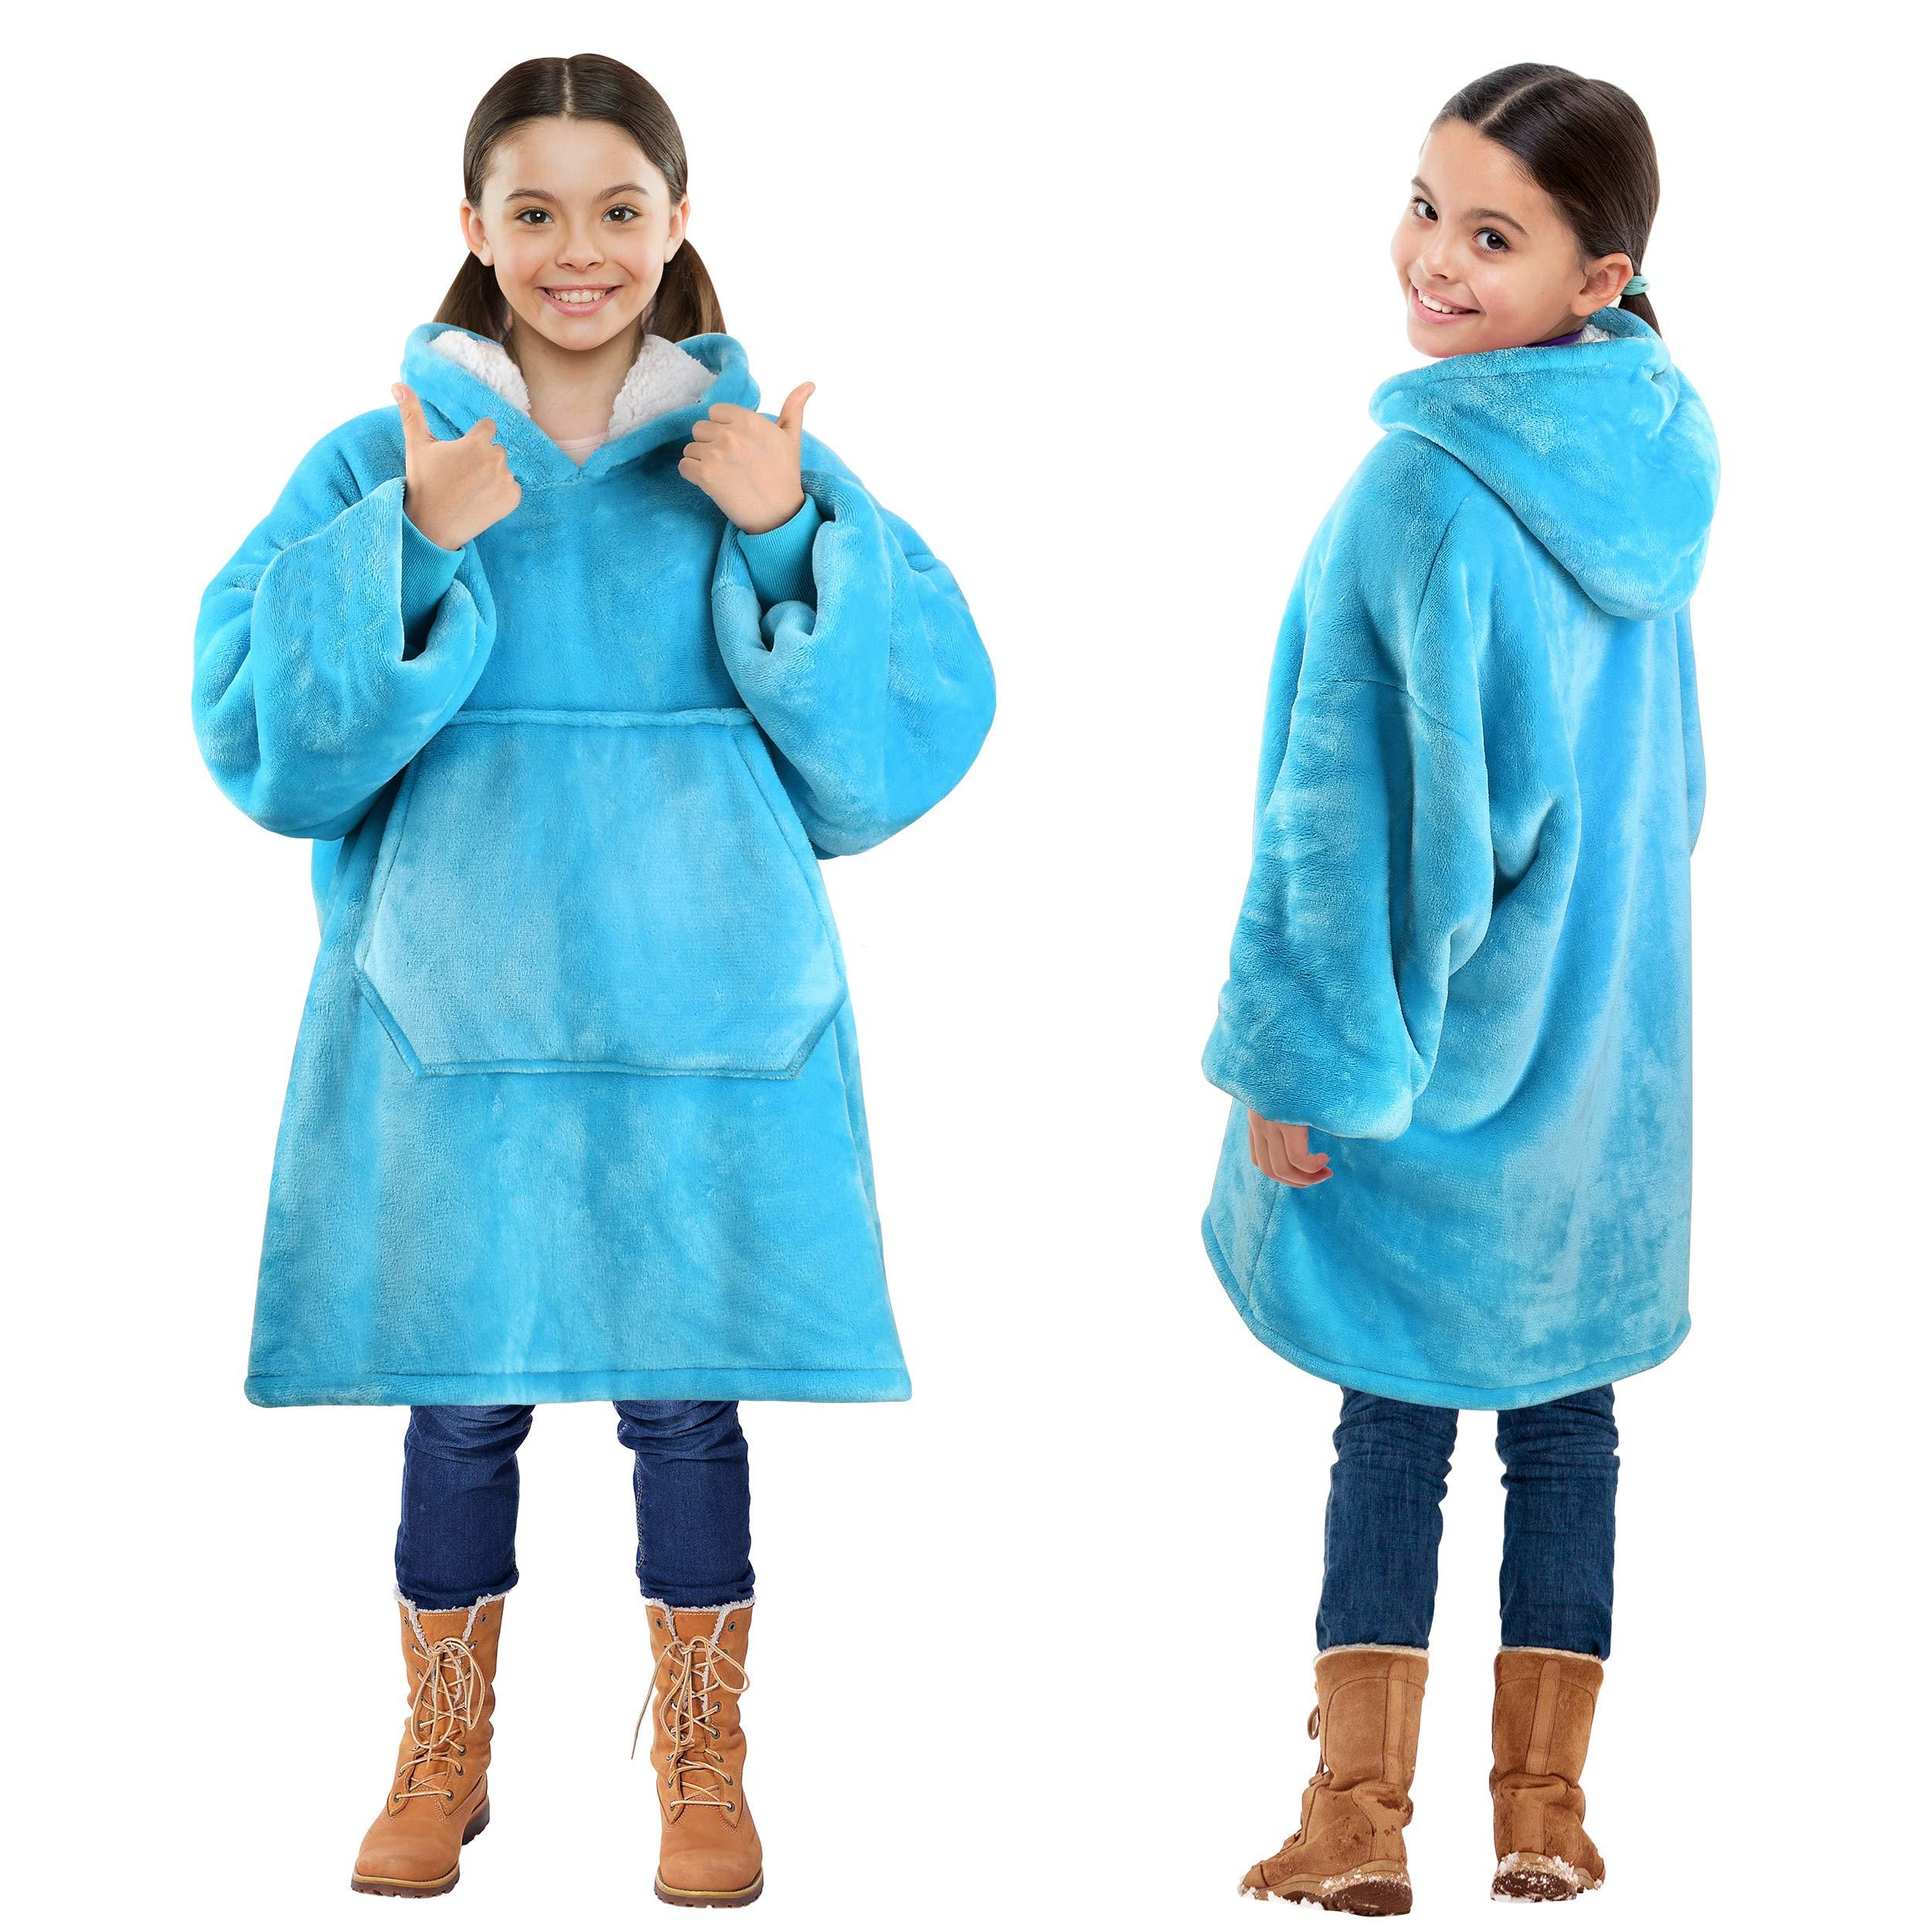 Kids Blanket Sweatshirt, Super Soft Warm Cozy Wearable Sherpa Hoodie for Children, Boys, Girls, Oversize, Reversible, Hood & Large Pocket, One Size, Light Blue by Solaris